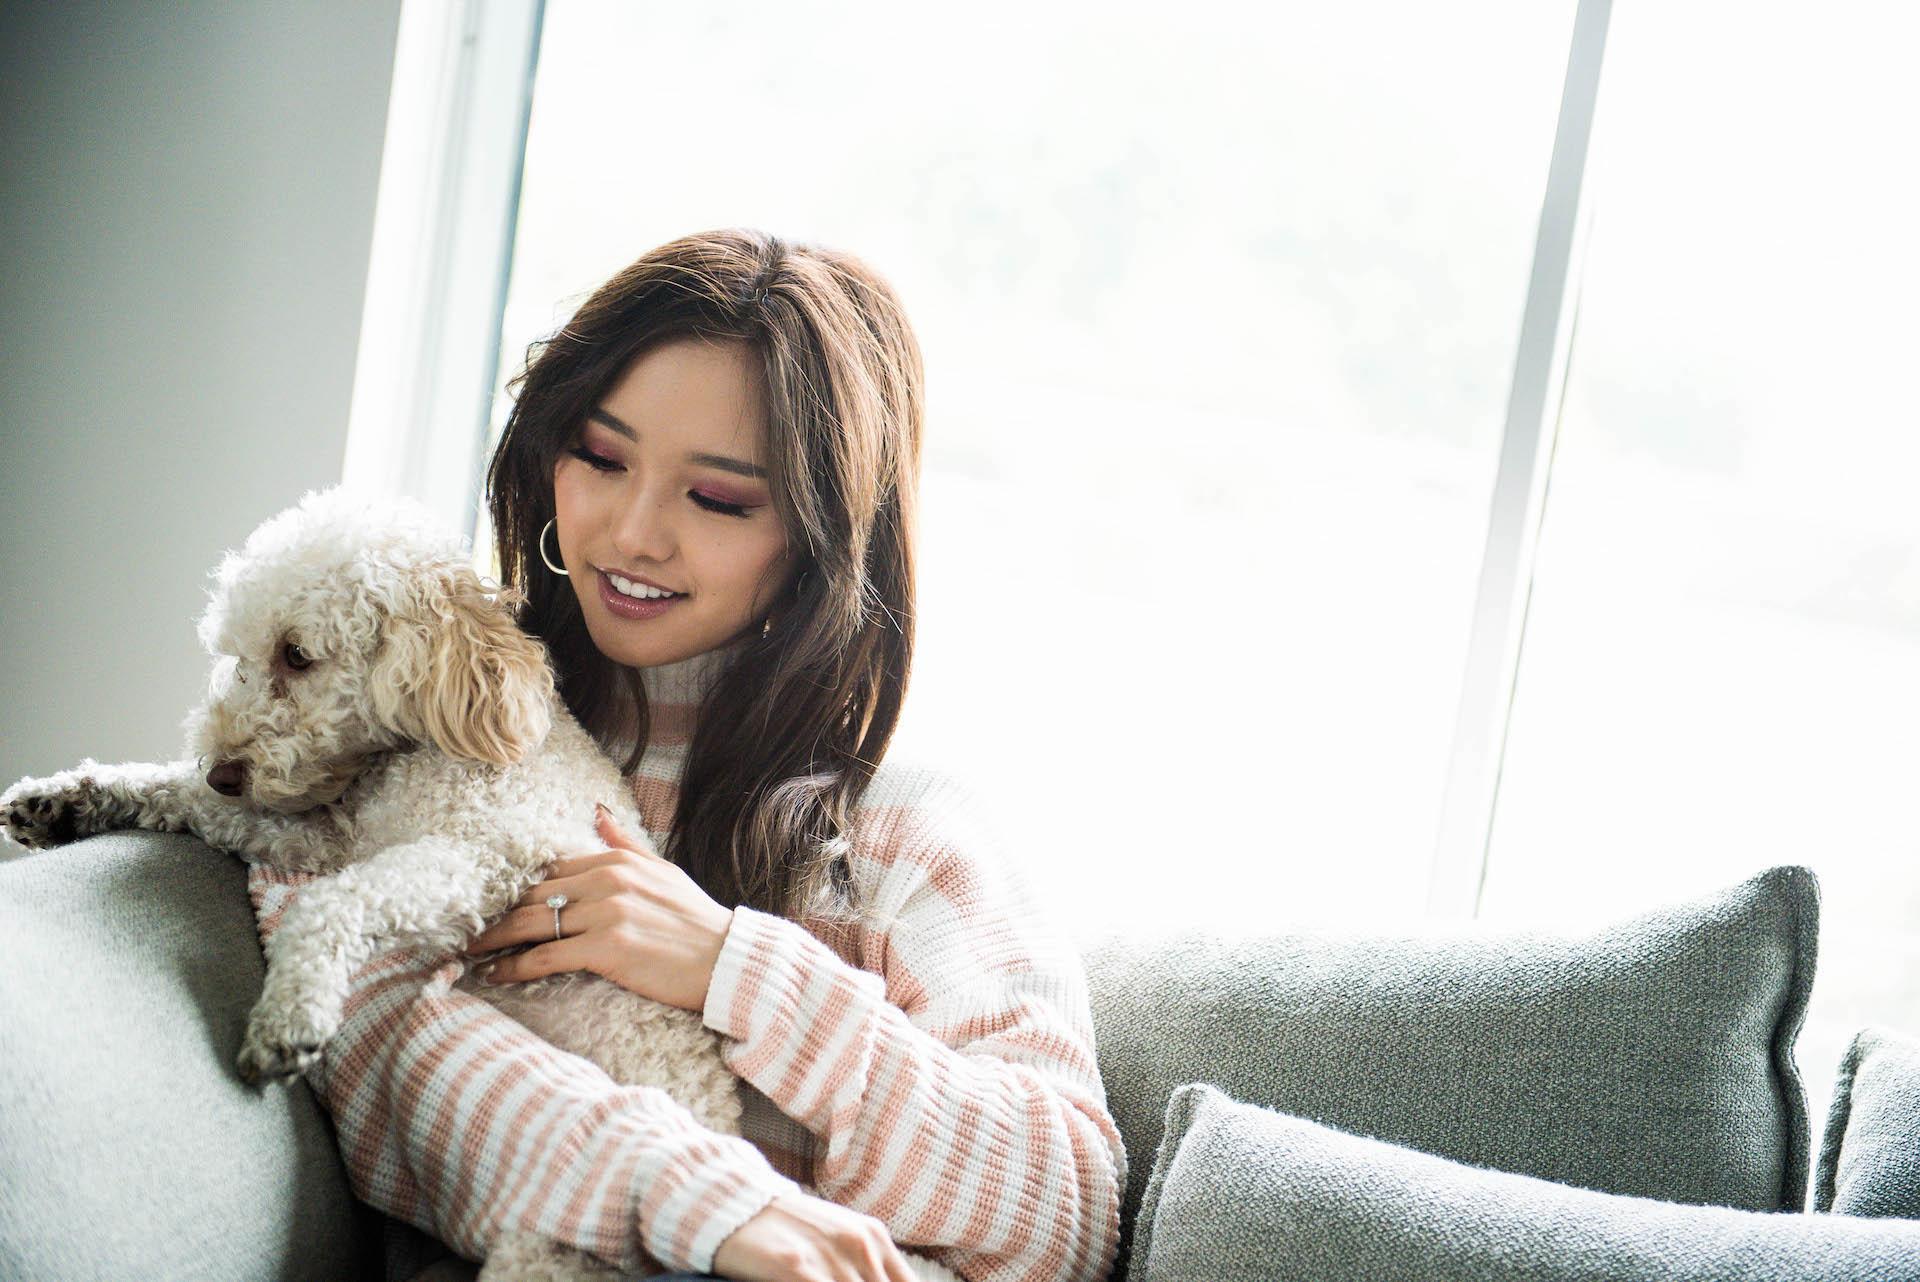 Jenn chilling with Cheeki wearing her  Salmon Stripe Sweater  from Eggie. Photo by George Ko